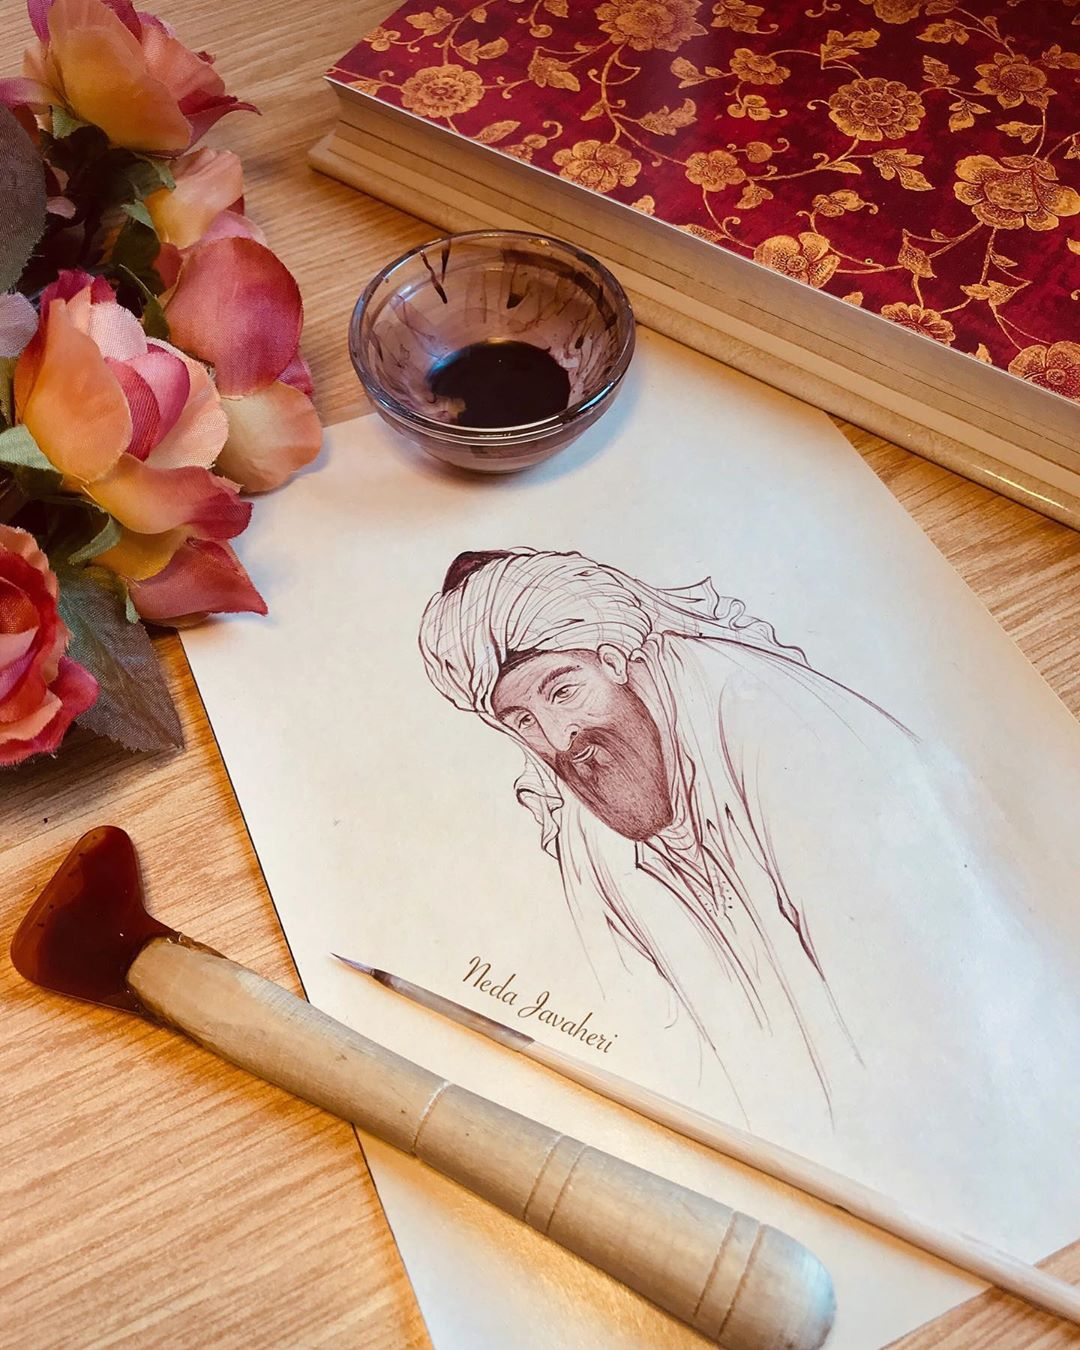 Karya Kaligrafi  در خواب دوش پیری در کوی عشق دیدم با دست اشارتم کرد که عزم سوی ما کن گر اژدهاست …- Ne Javaher